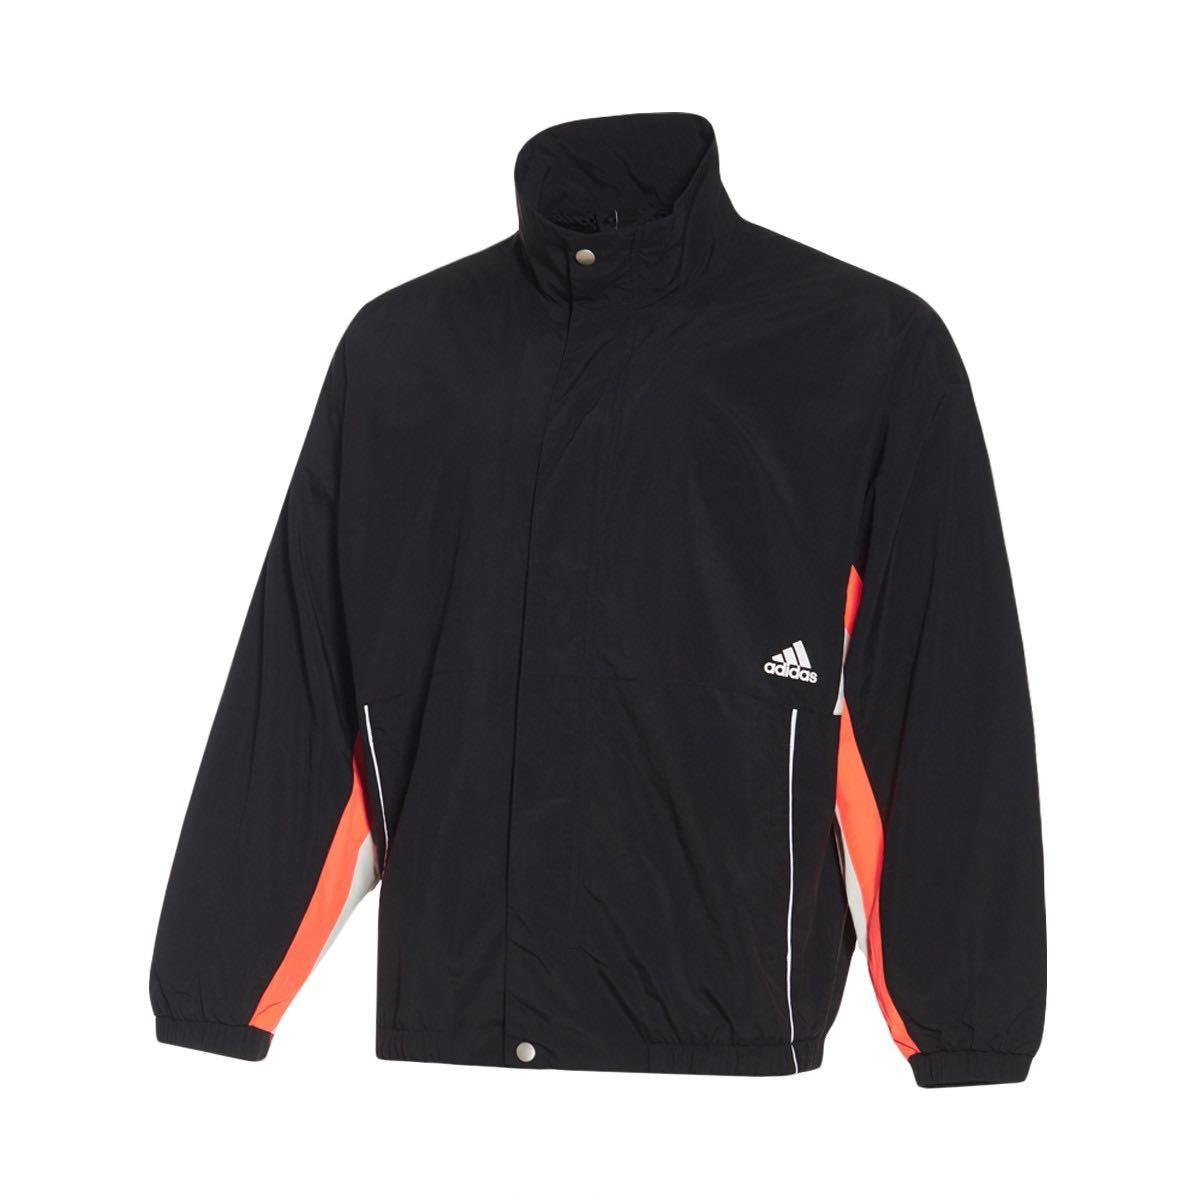 adidas 阿迪达斯 M MH CB JKT FM5455 男士夹克外套